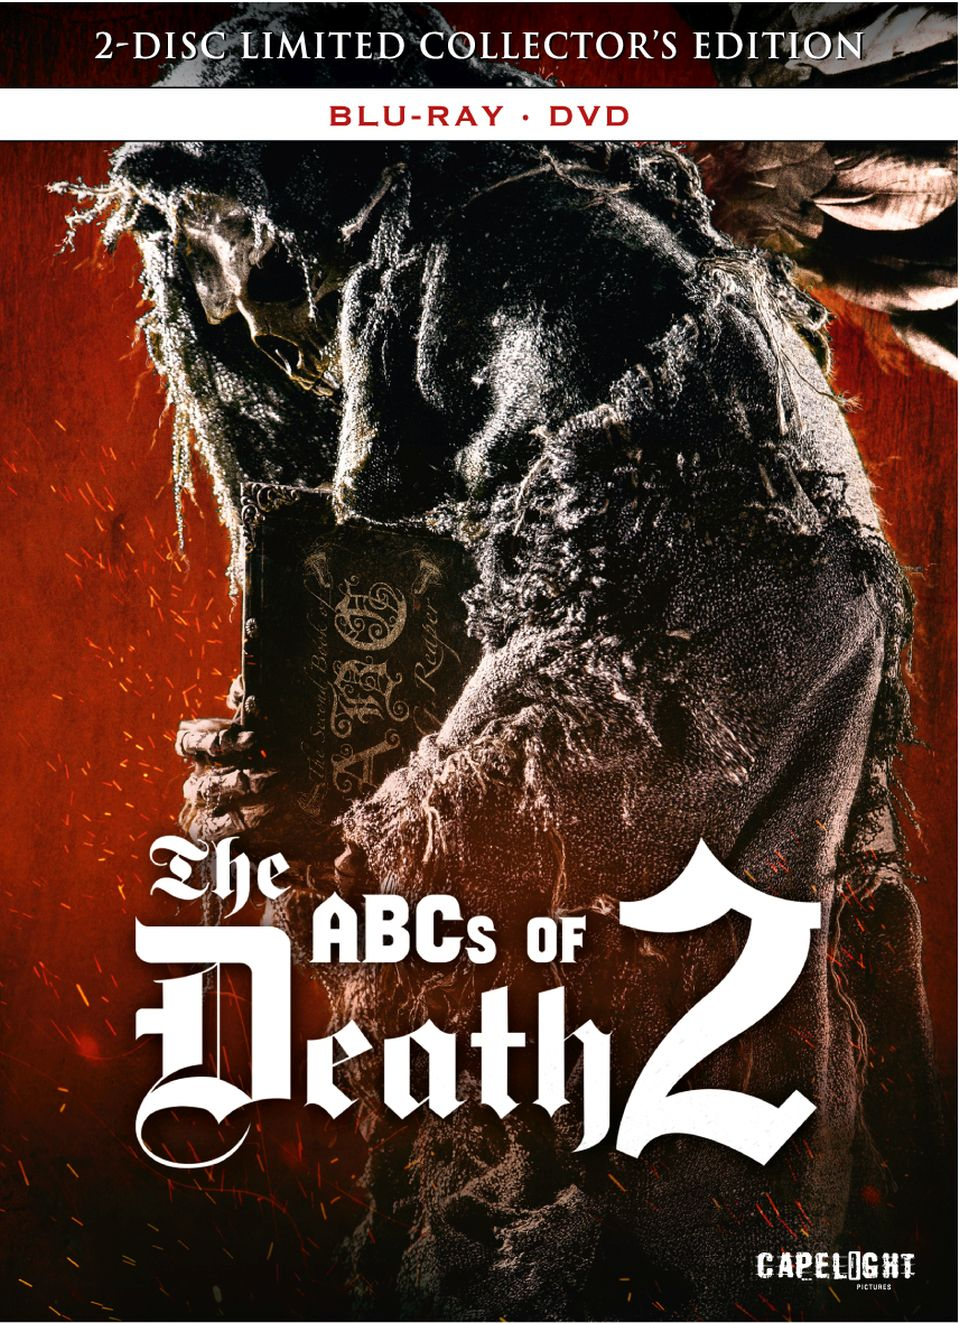 2011 Abcs_of_death_2_2014 avi